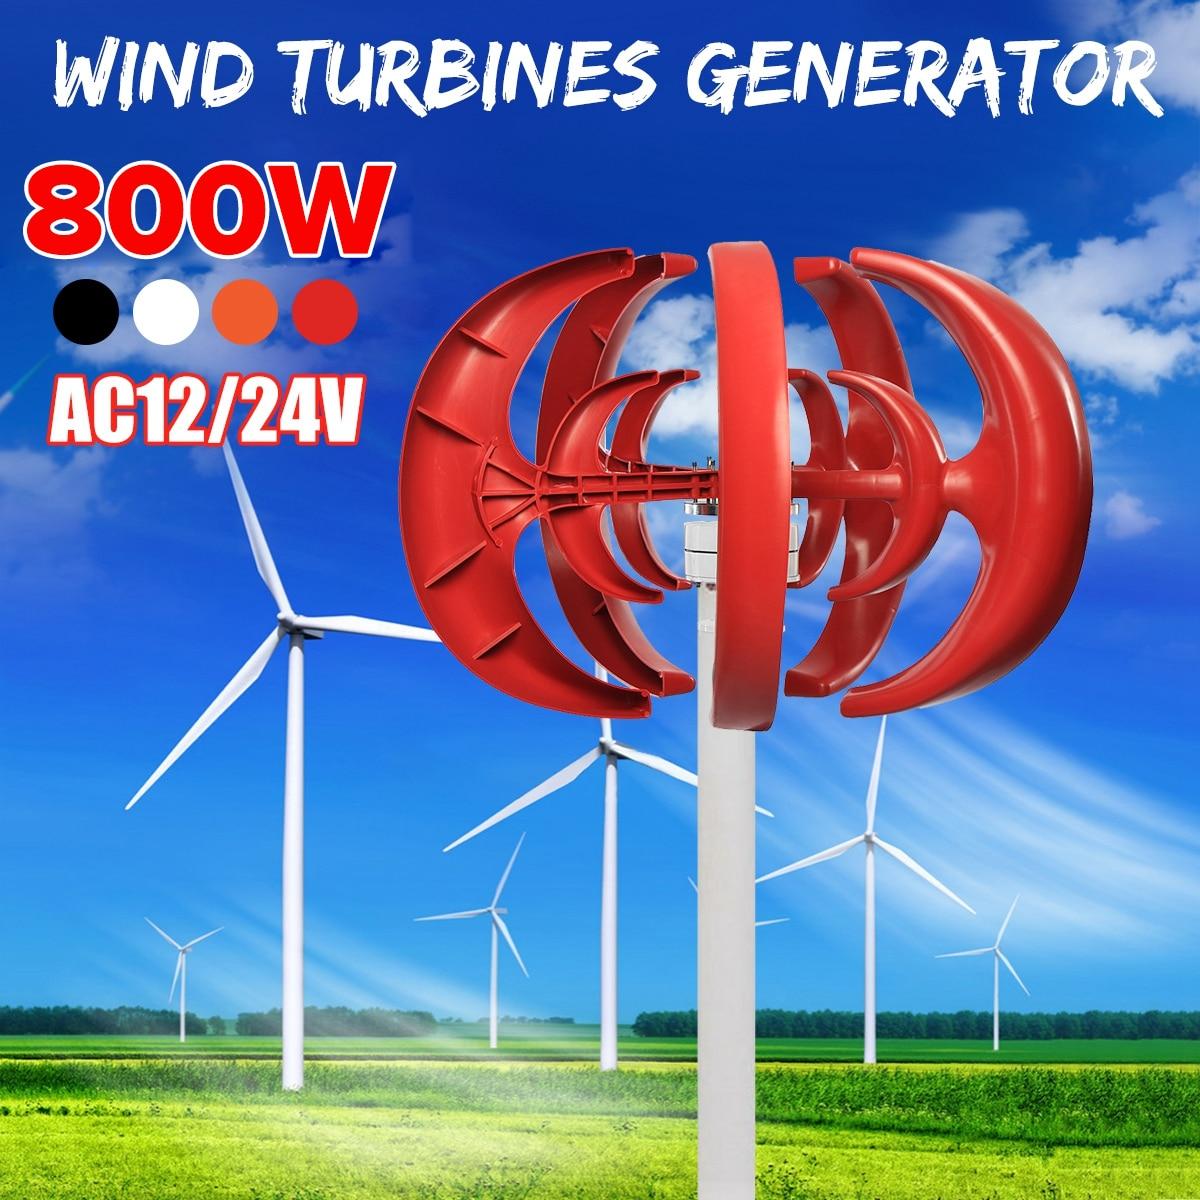 Max 800W AC 12 24V Wind T urbine Generator Lantern 5 Blades Motor Kit Vertical Axis